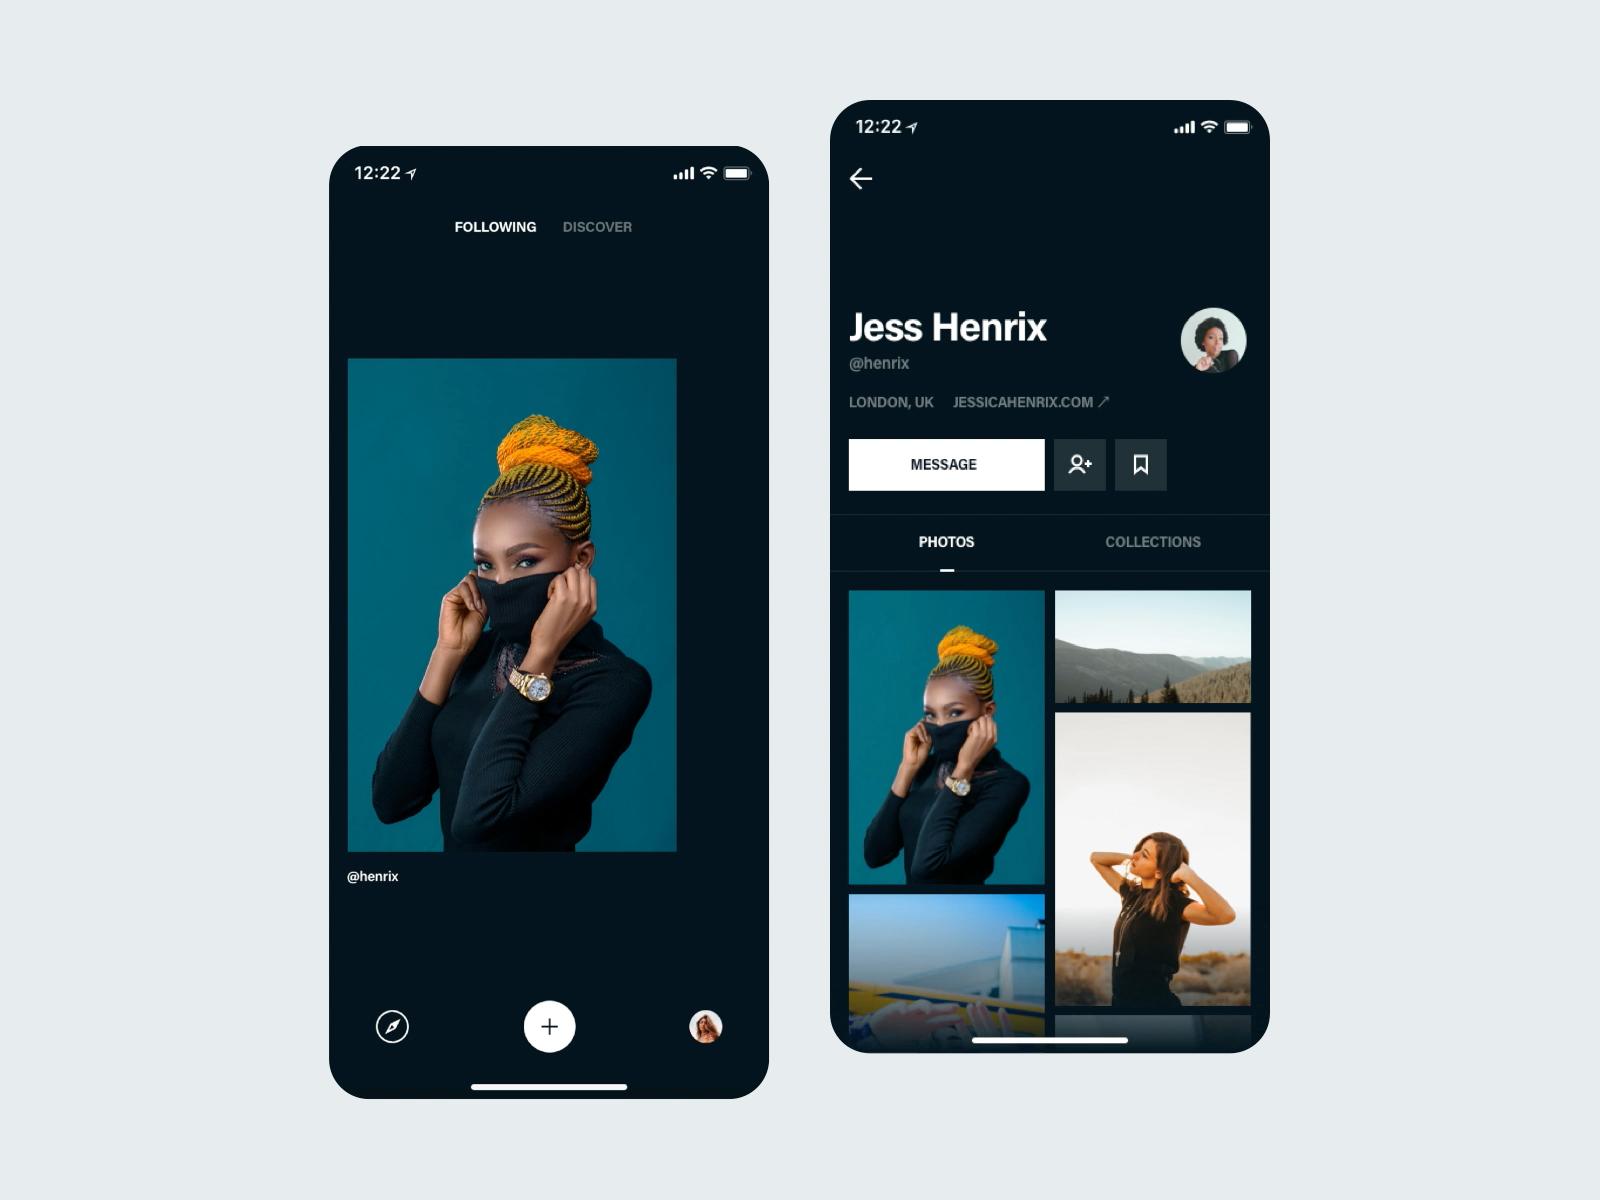 Browse Photos & Profile Screen cover image